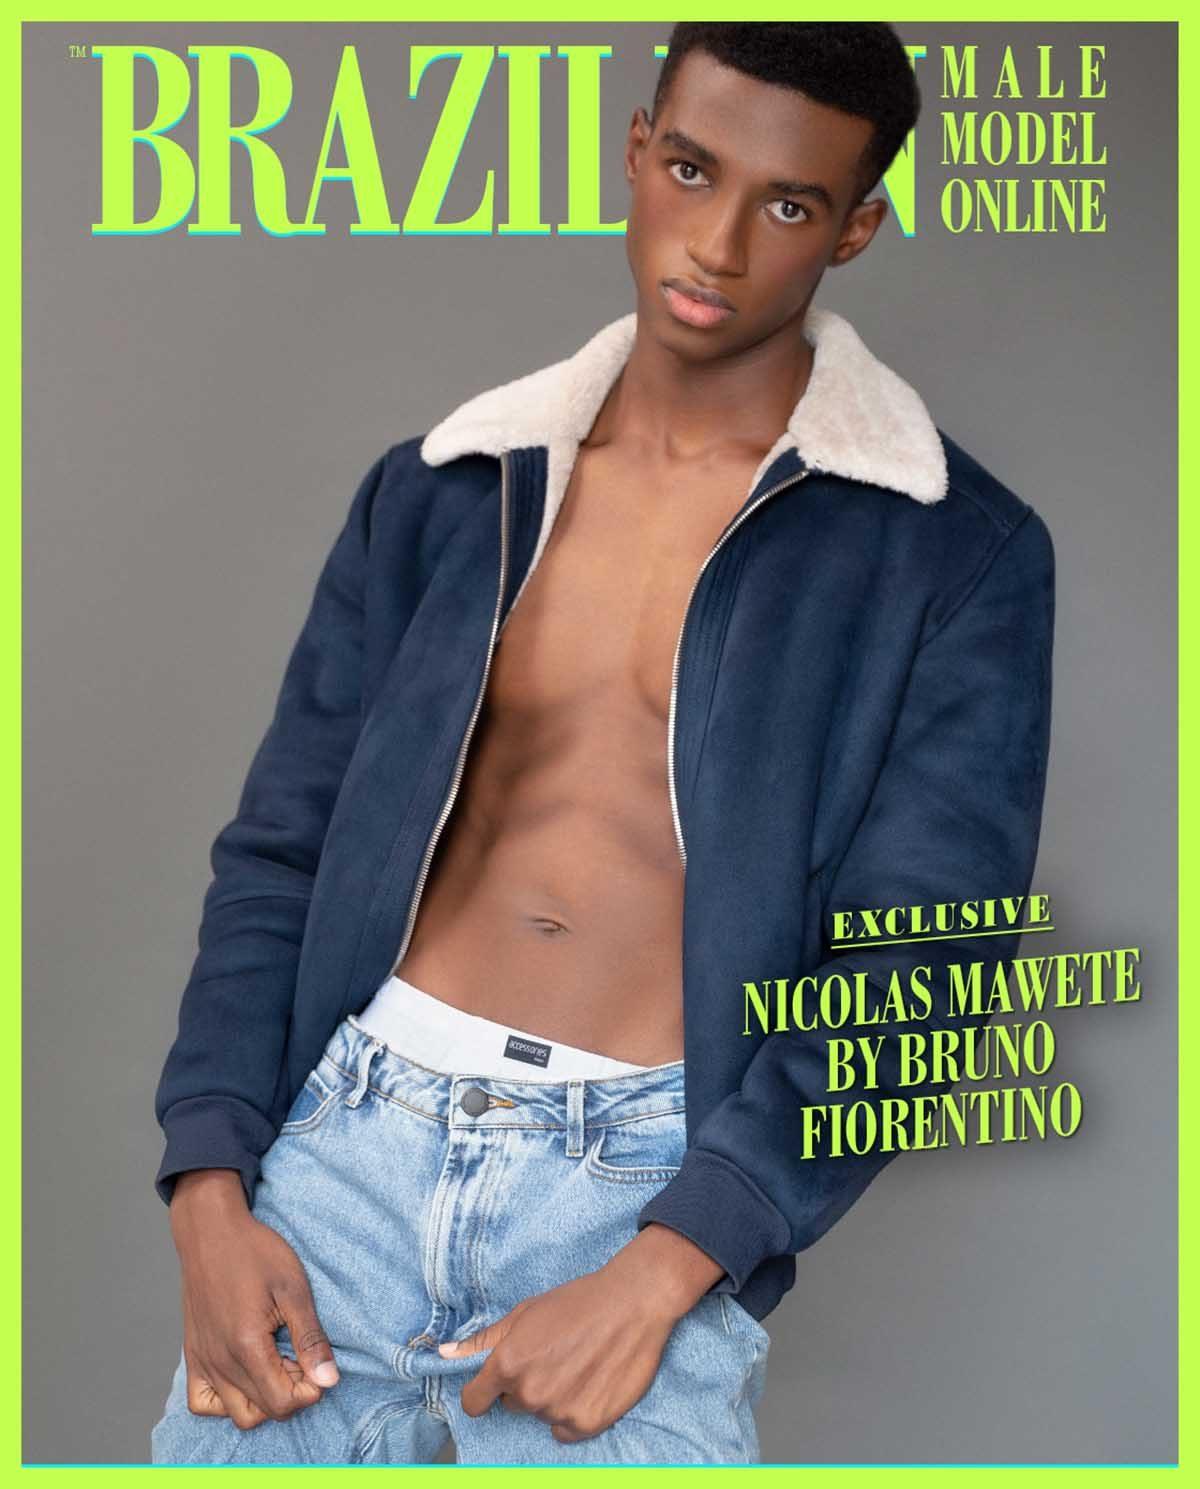 Nicolas Mawete by Bruno Fiorentino